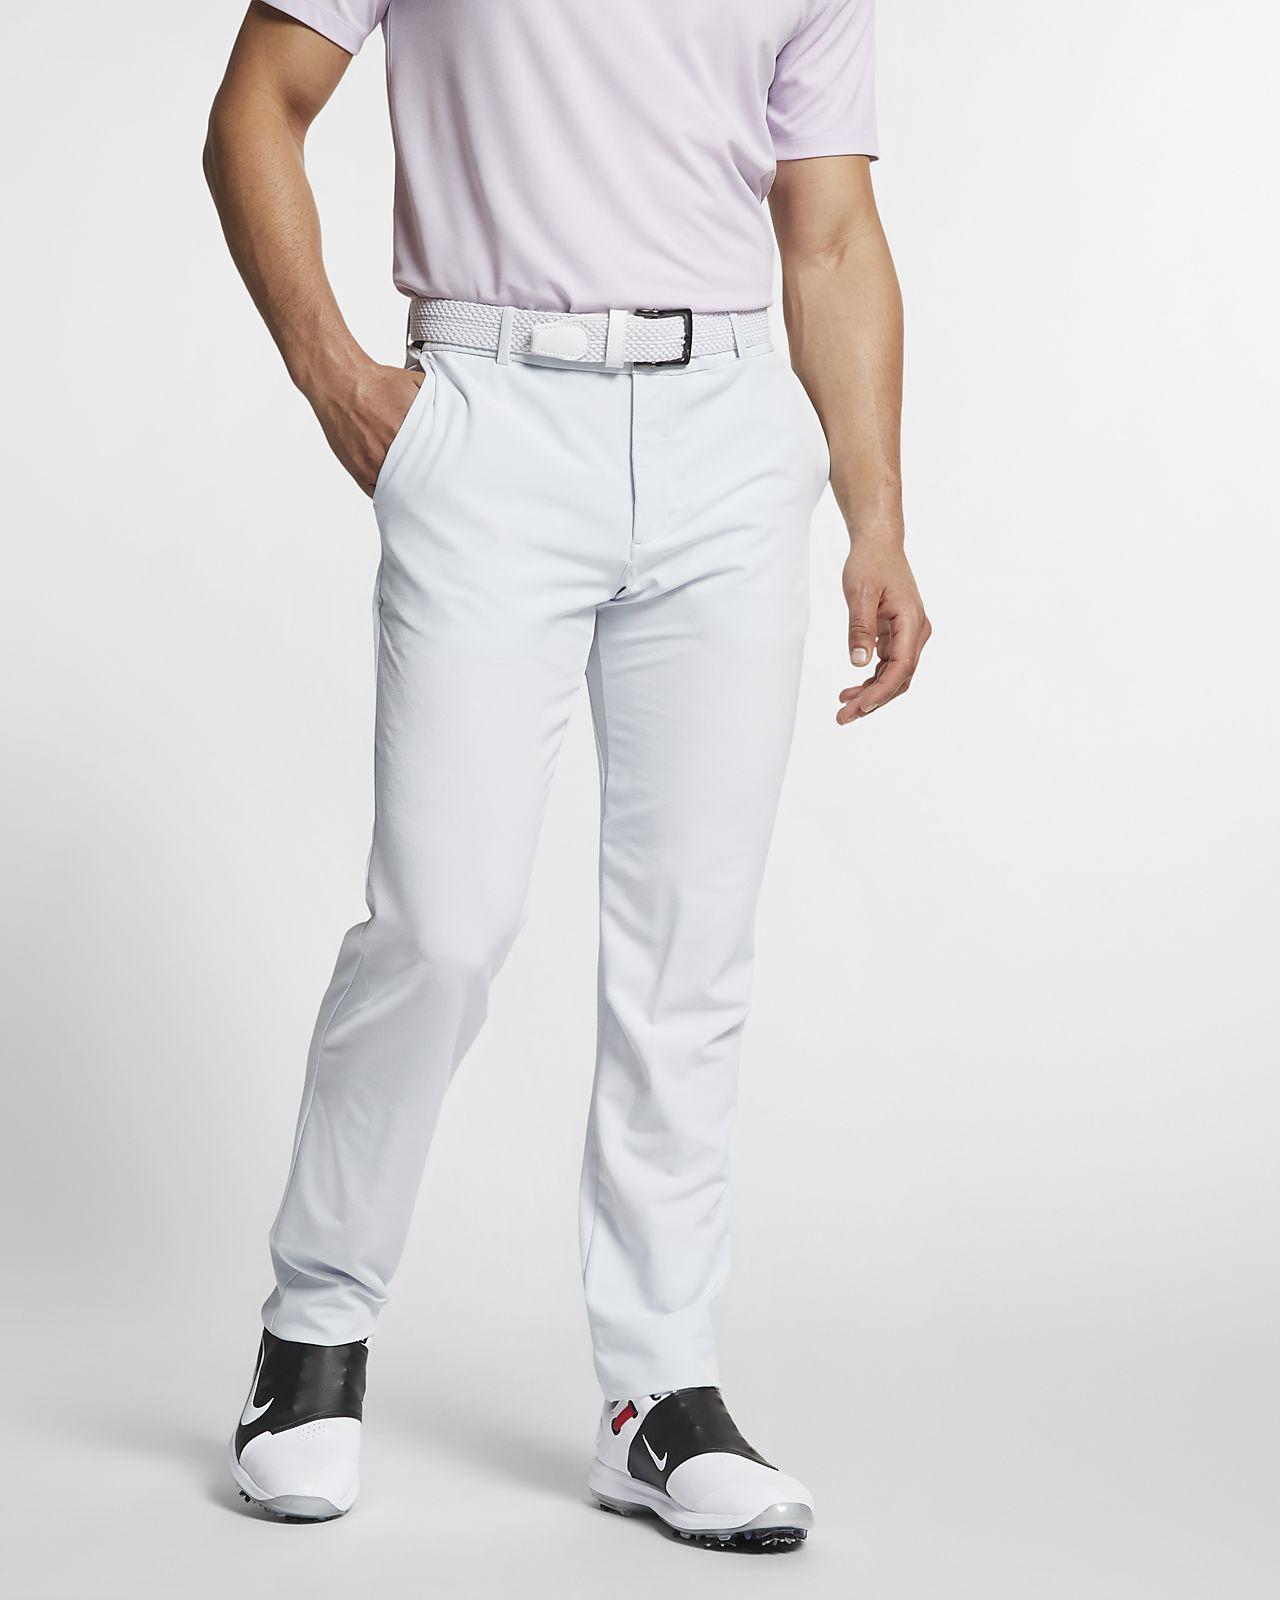 pantalon golf nike homme